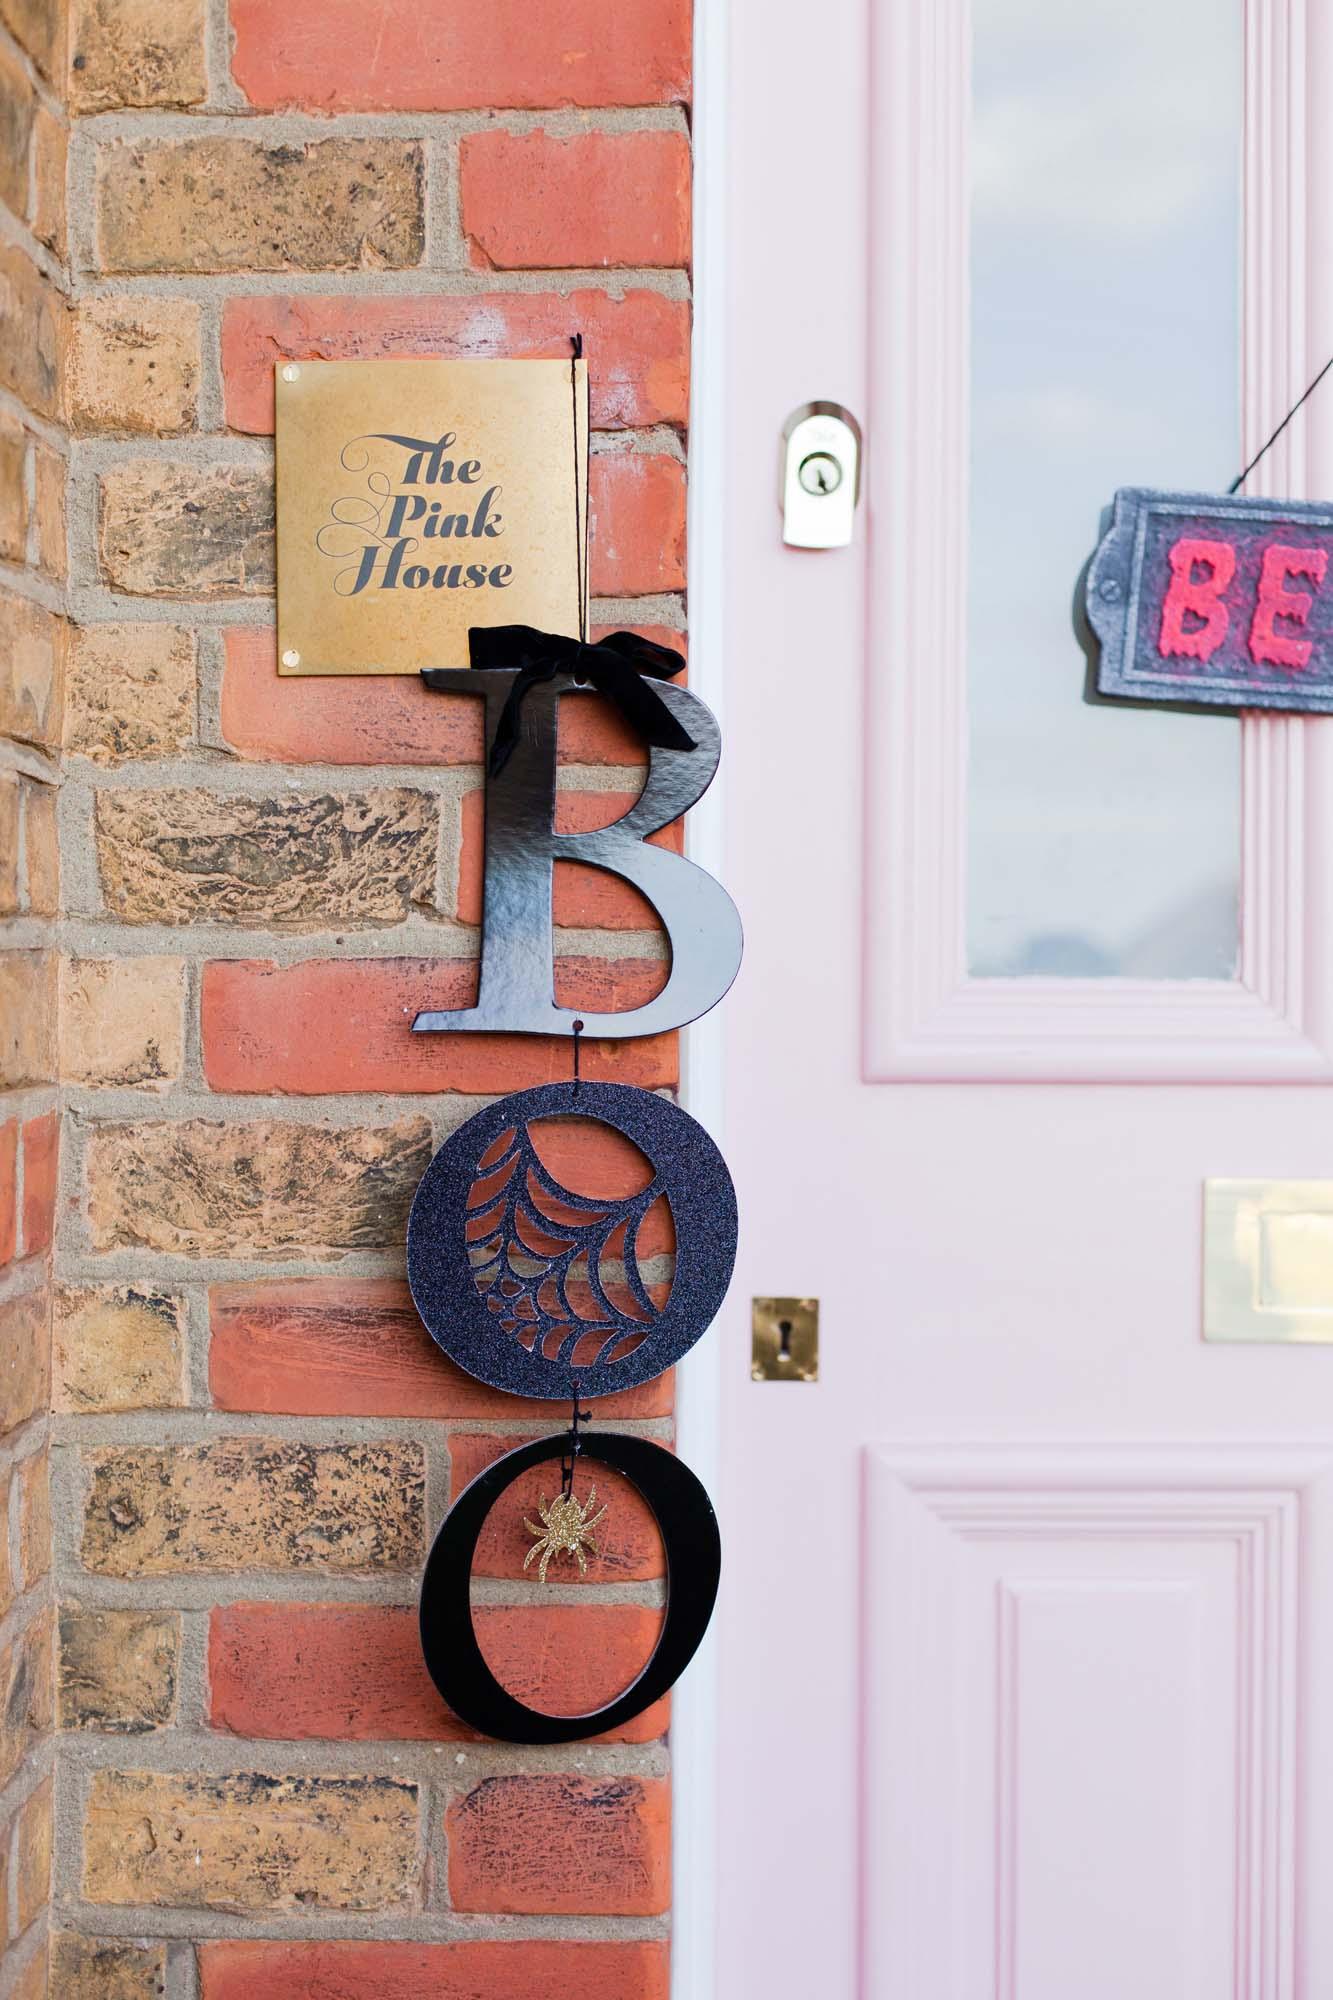 Boo door decoration from Sainsbury's Home Halloween range